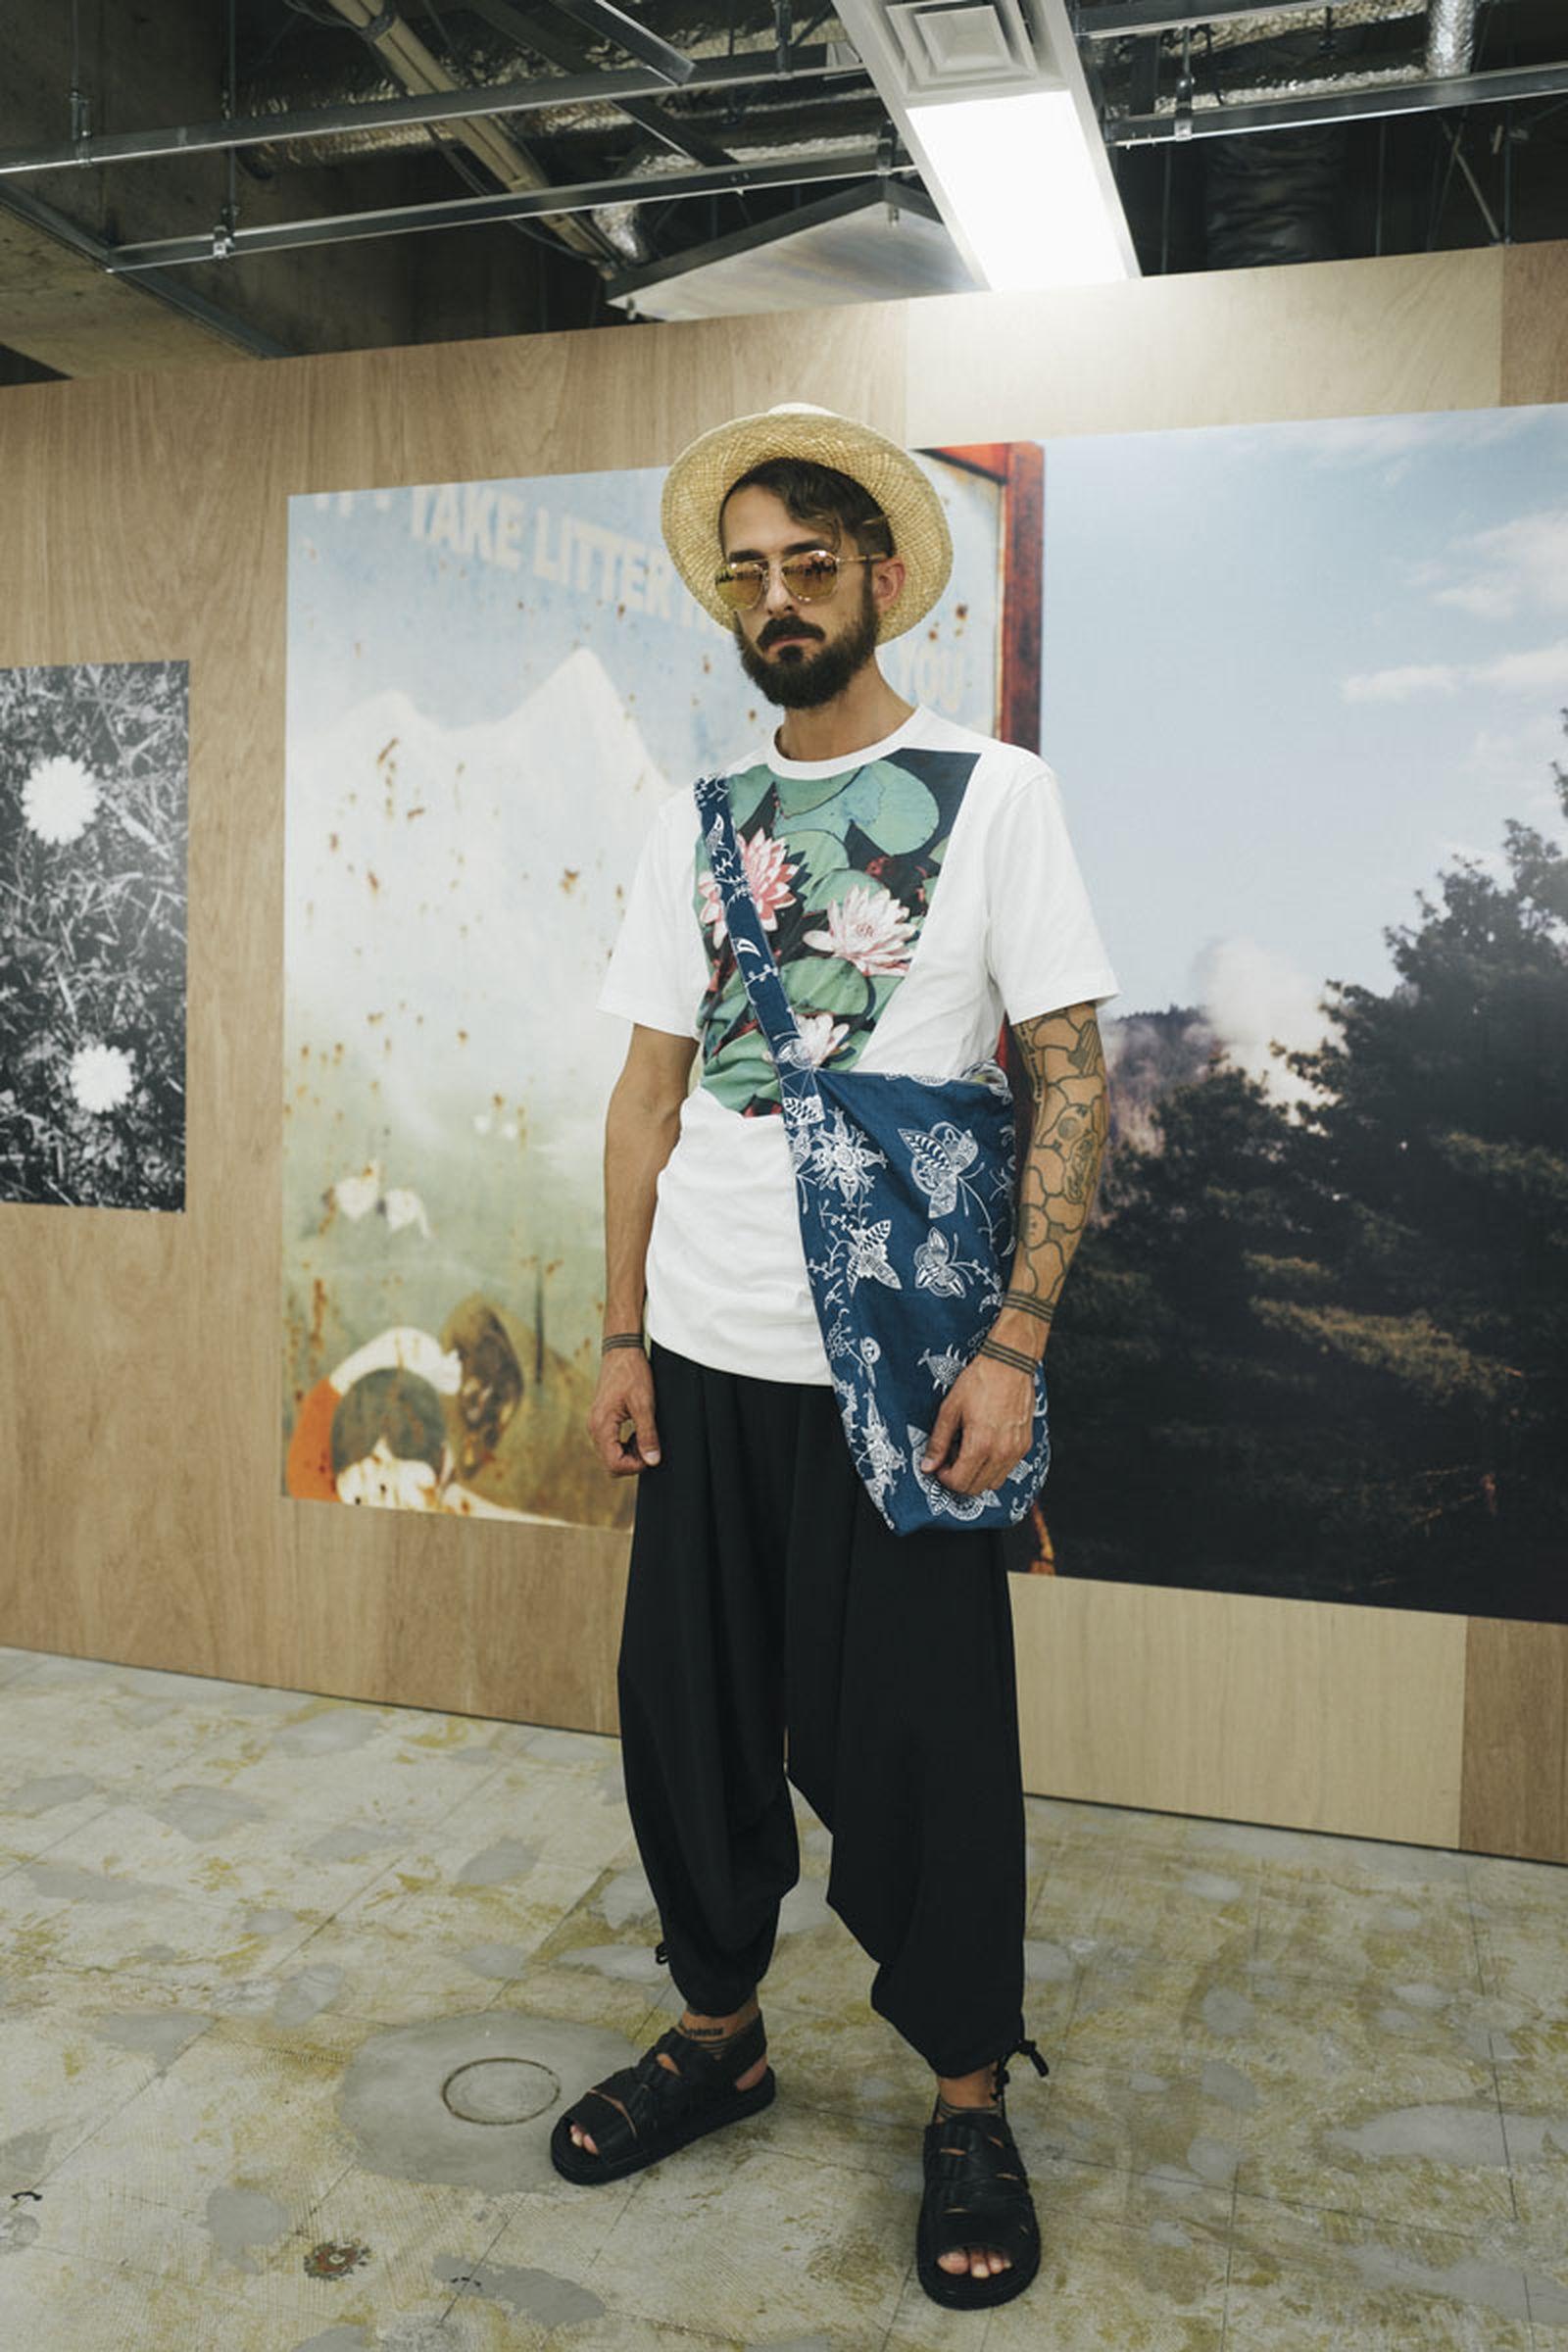 junya-watanabe-spring-summer-2022-collection-08